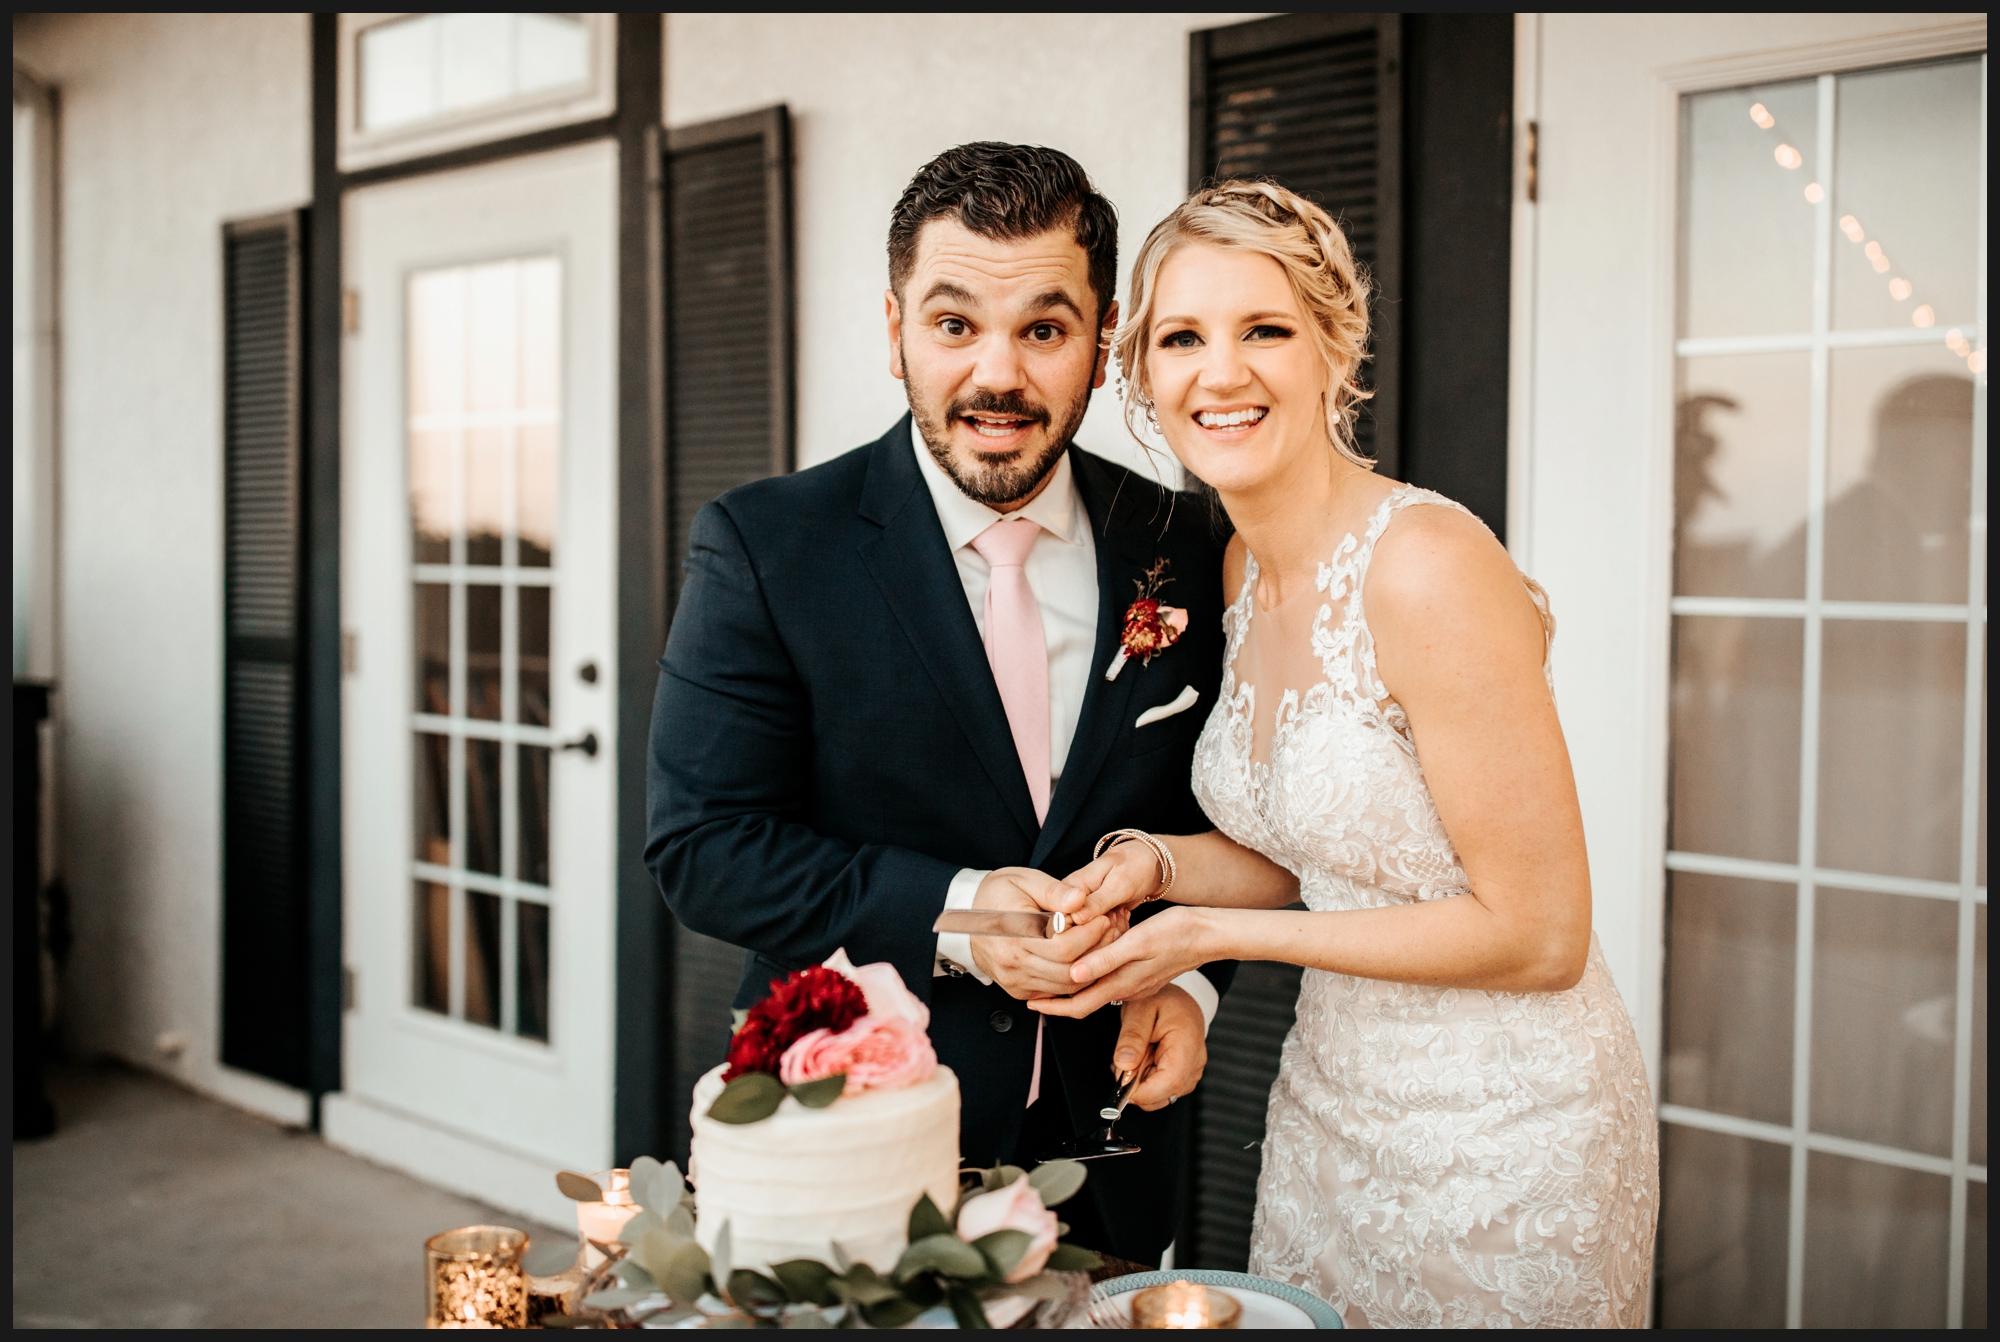 Orlando-Wedding-Photographer-destination-wedding-photographer-florida-wedding-photographer-hawaii-wedding-photographer_0620.jpg